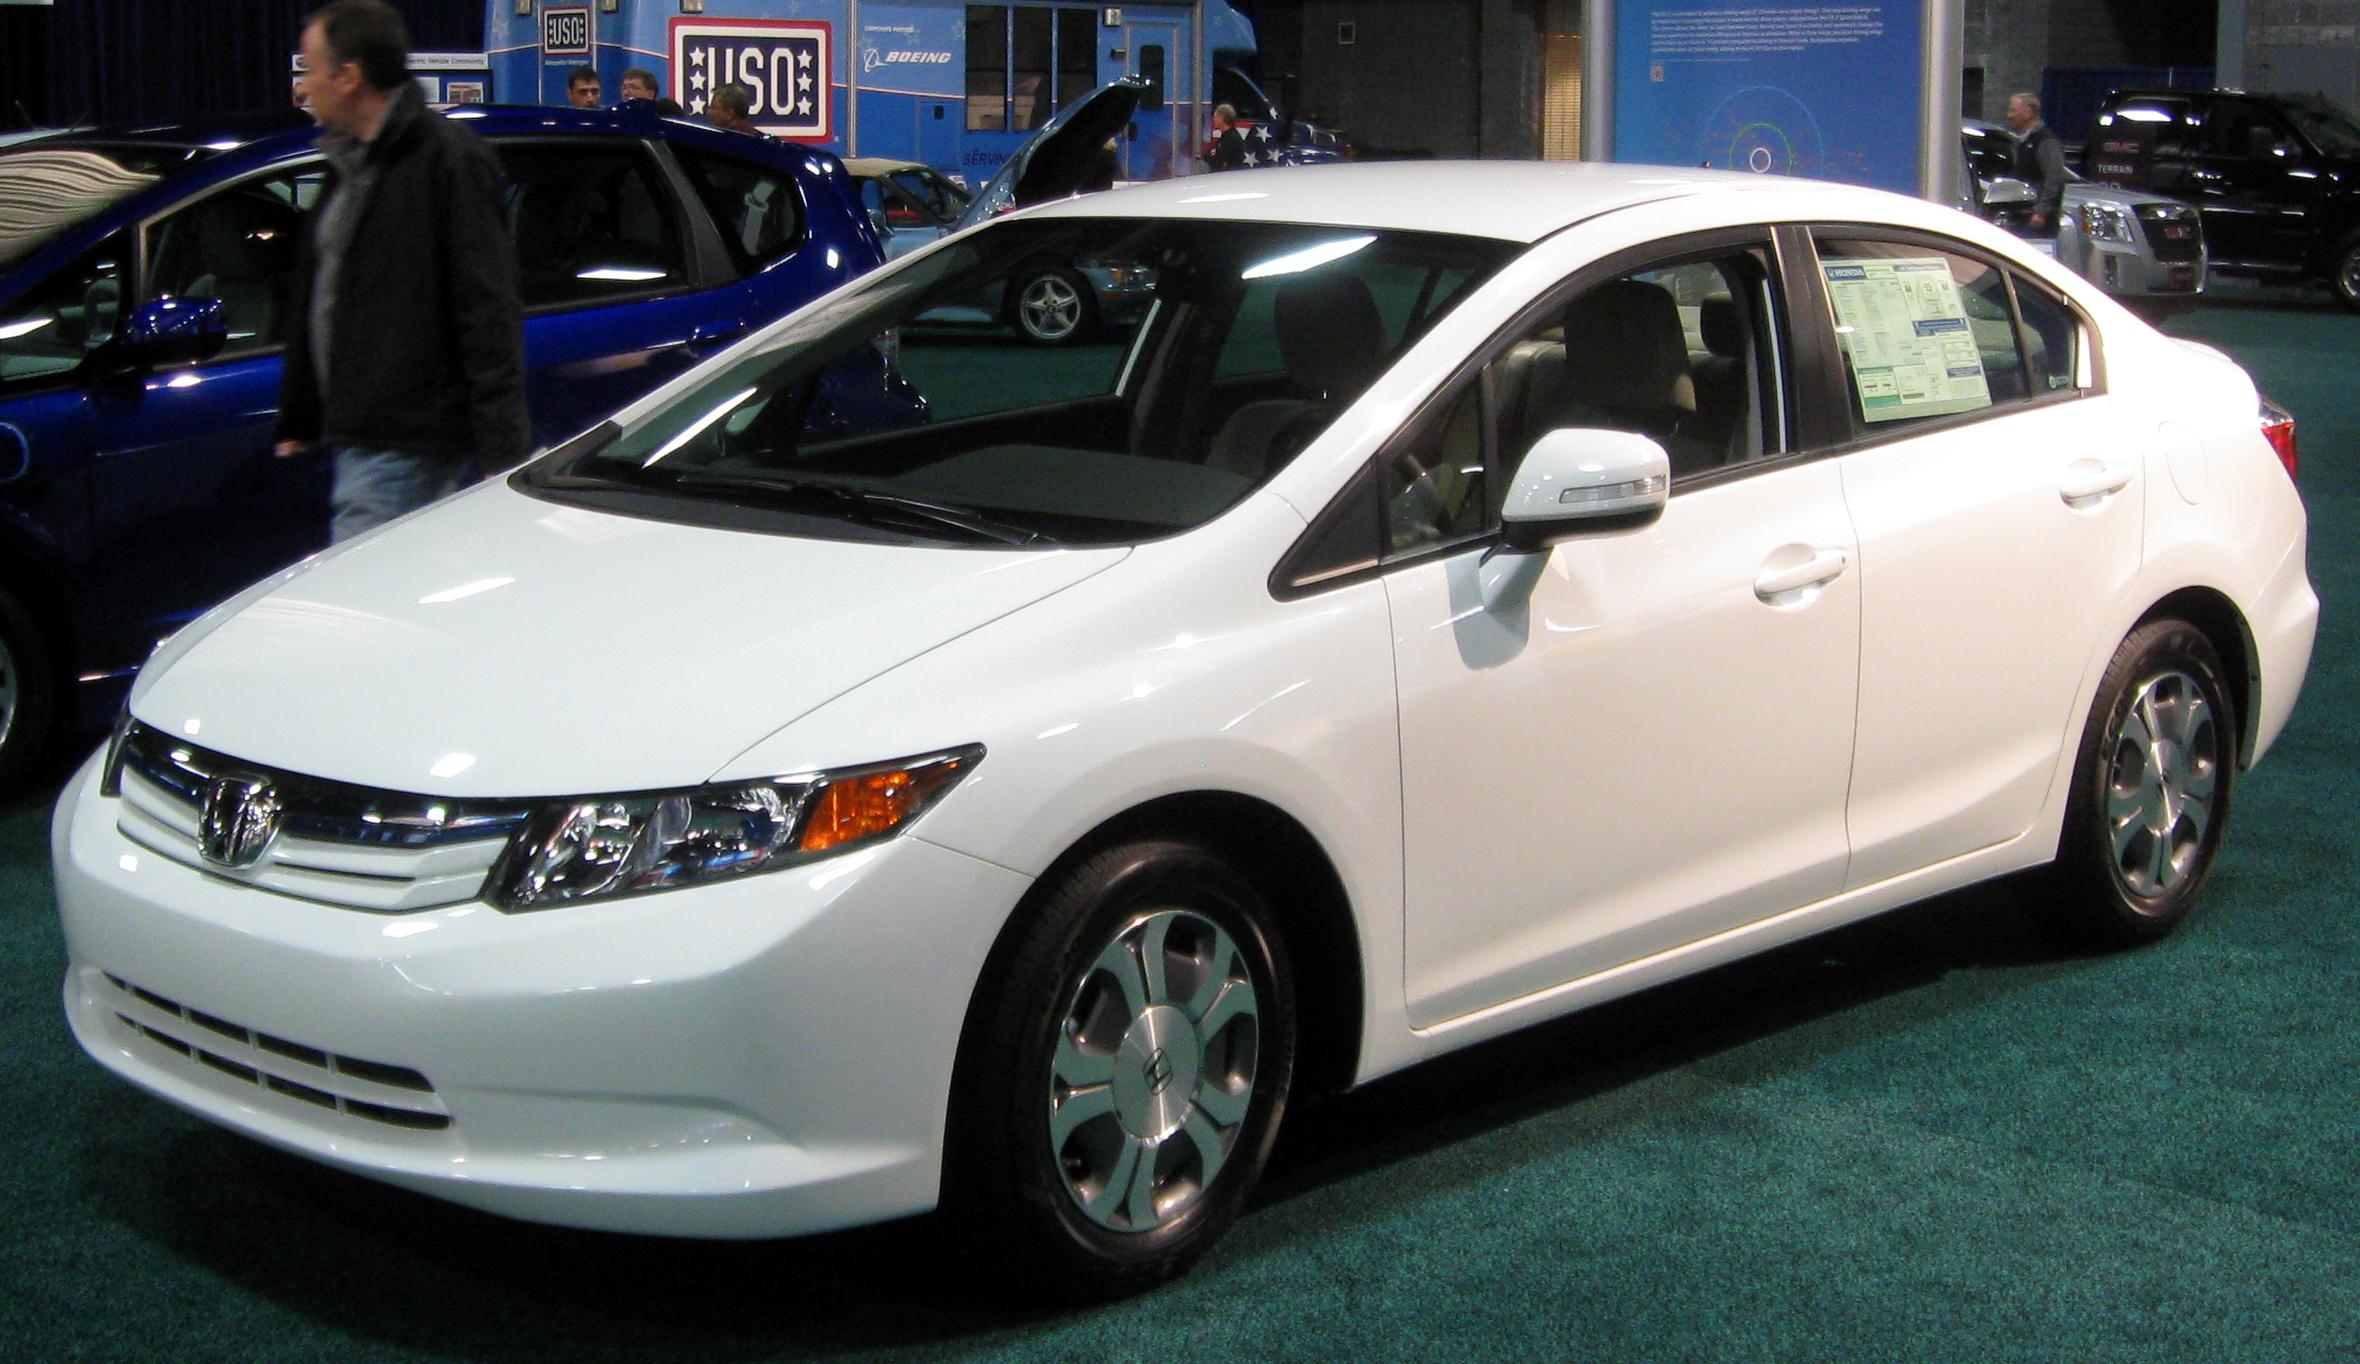 File:2012 Honda Civic Hybrid -- 2012 DC 1.JPG - Wikimedia Commons